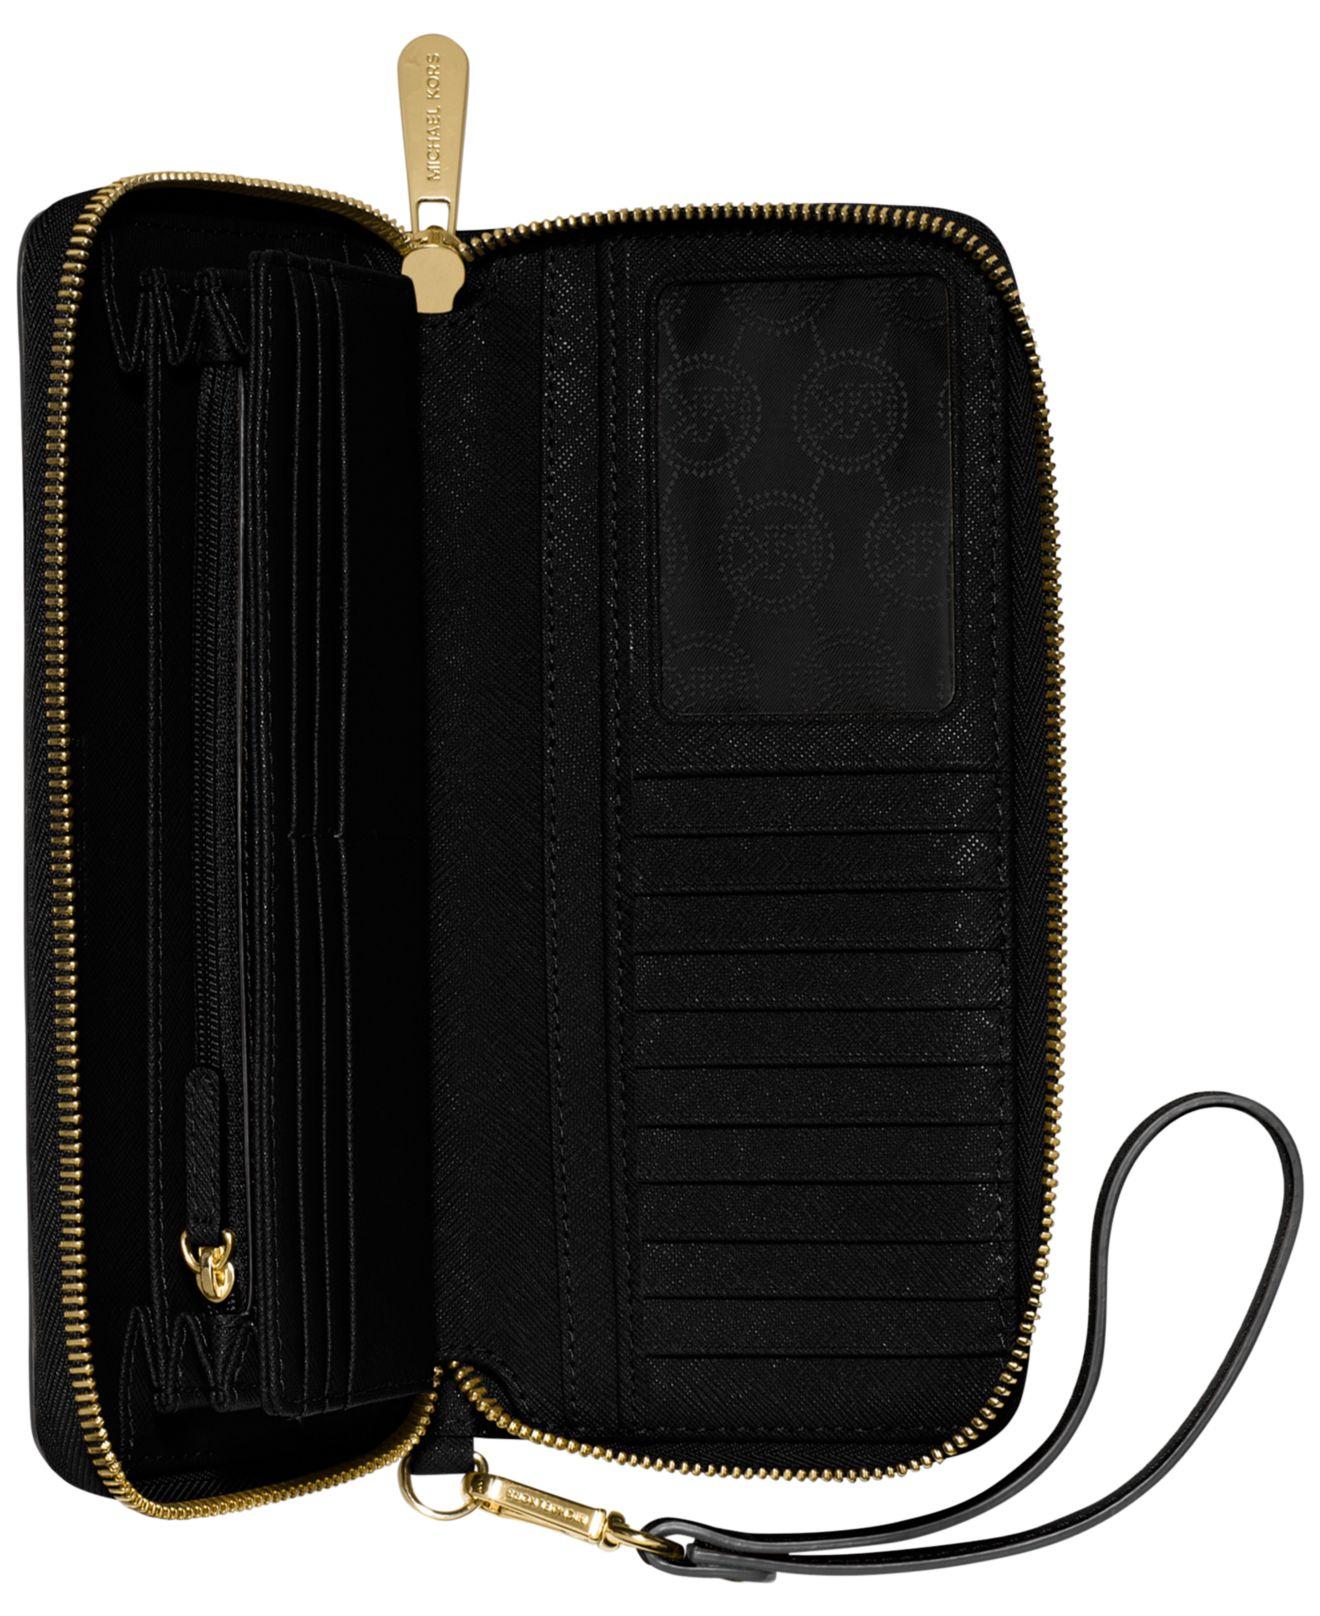 Michael Michael Kors Jet Set Travel Leather Continental Wallet: Michael Kors Jet Set Travel Continental Wallet In Black